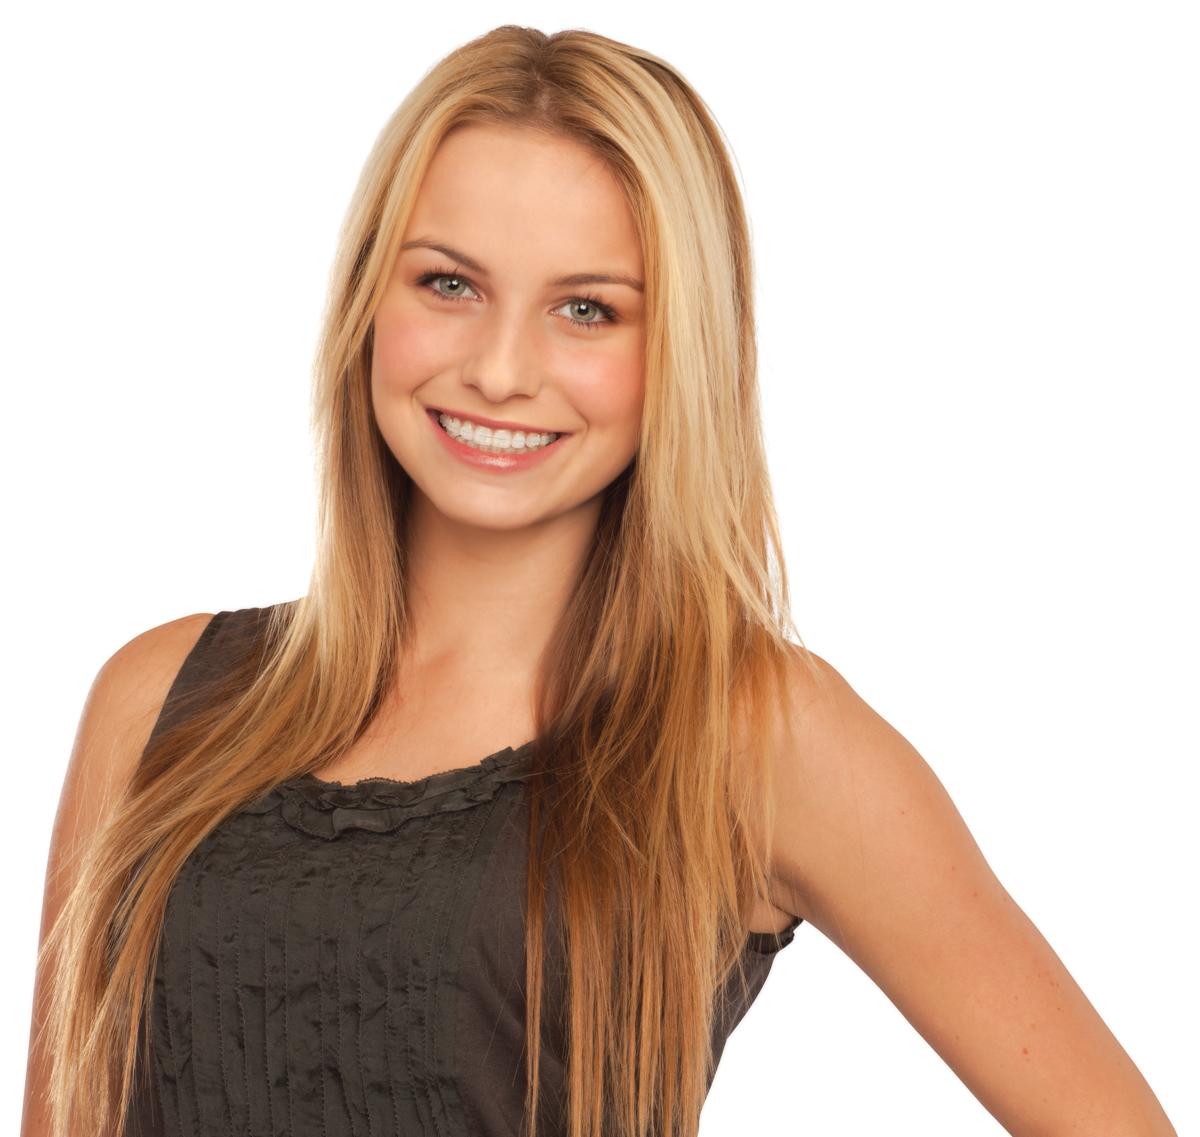 ClarityADV blond model LR